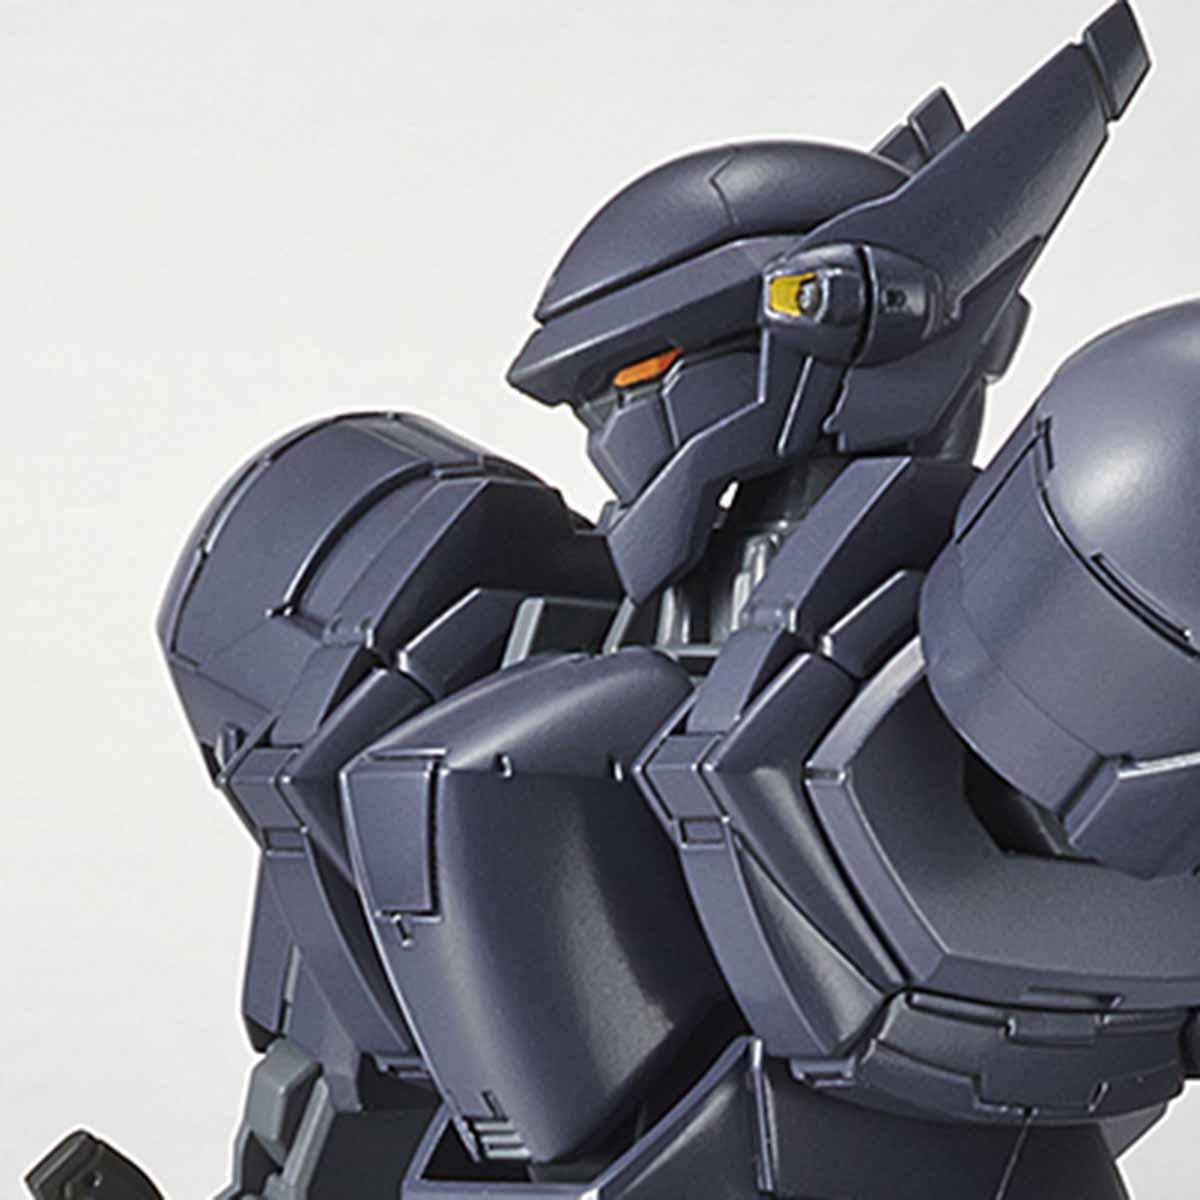 HG 1/60 M9Dファルケ Ver.IV